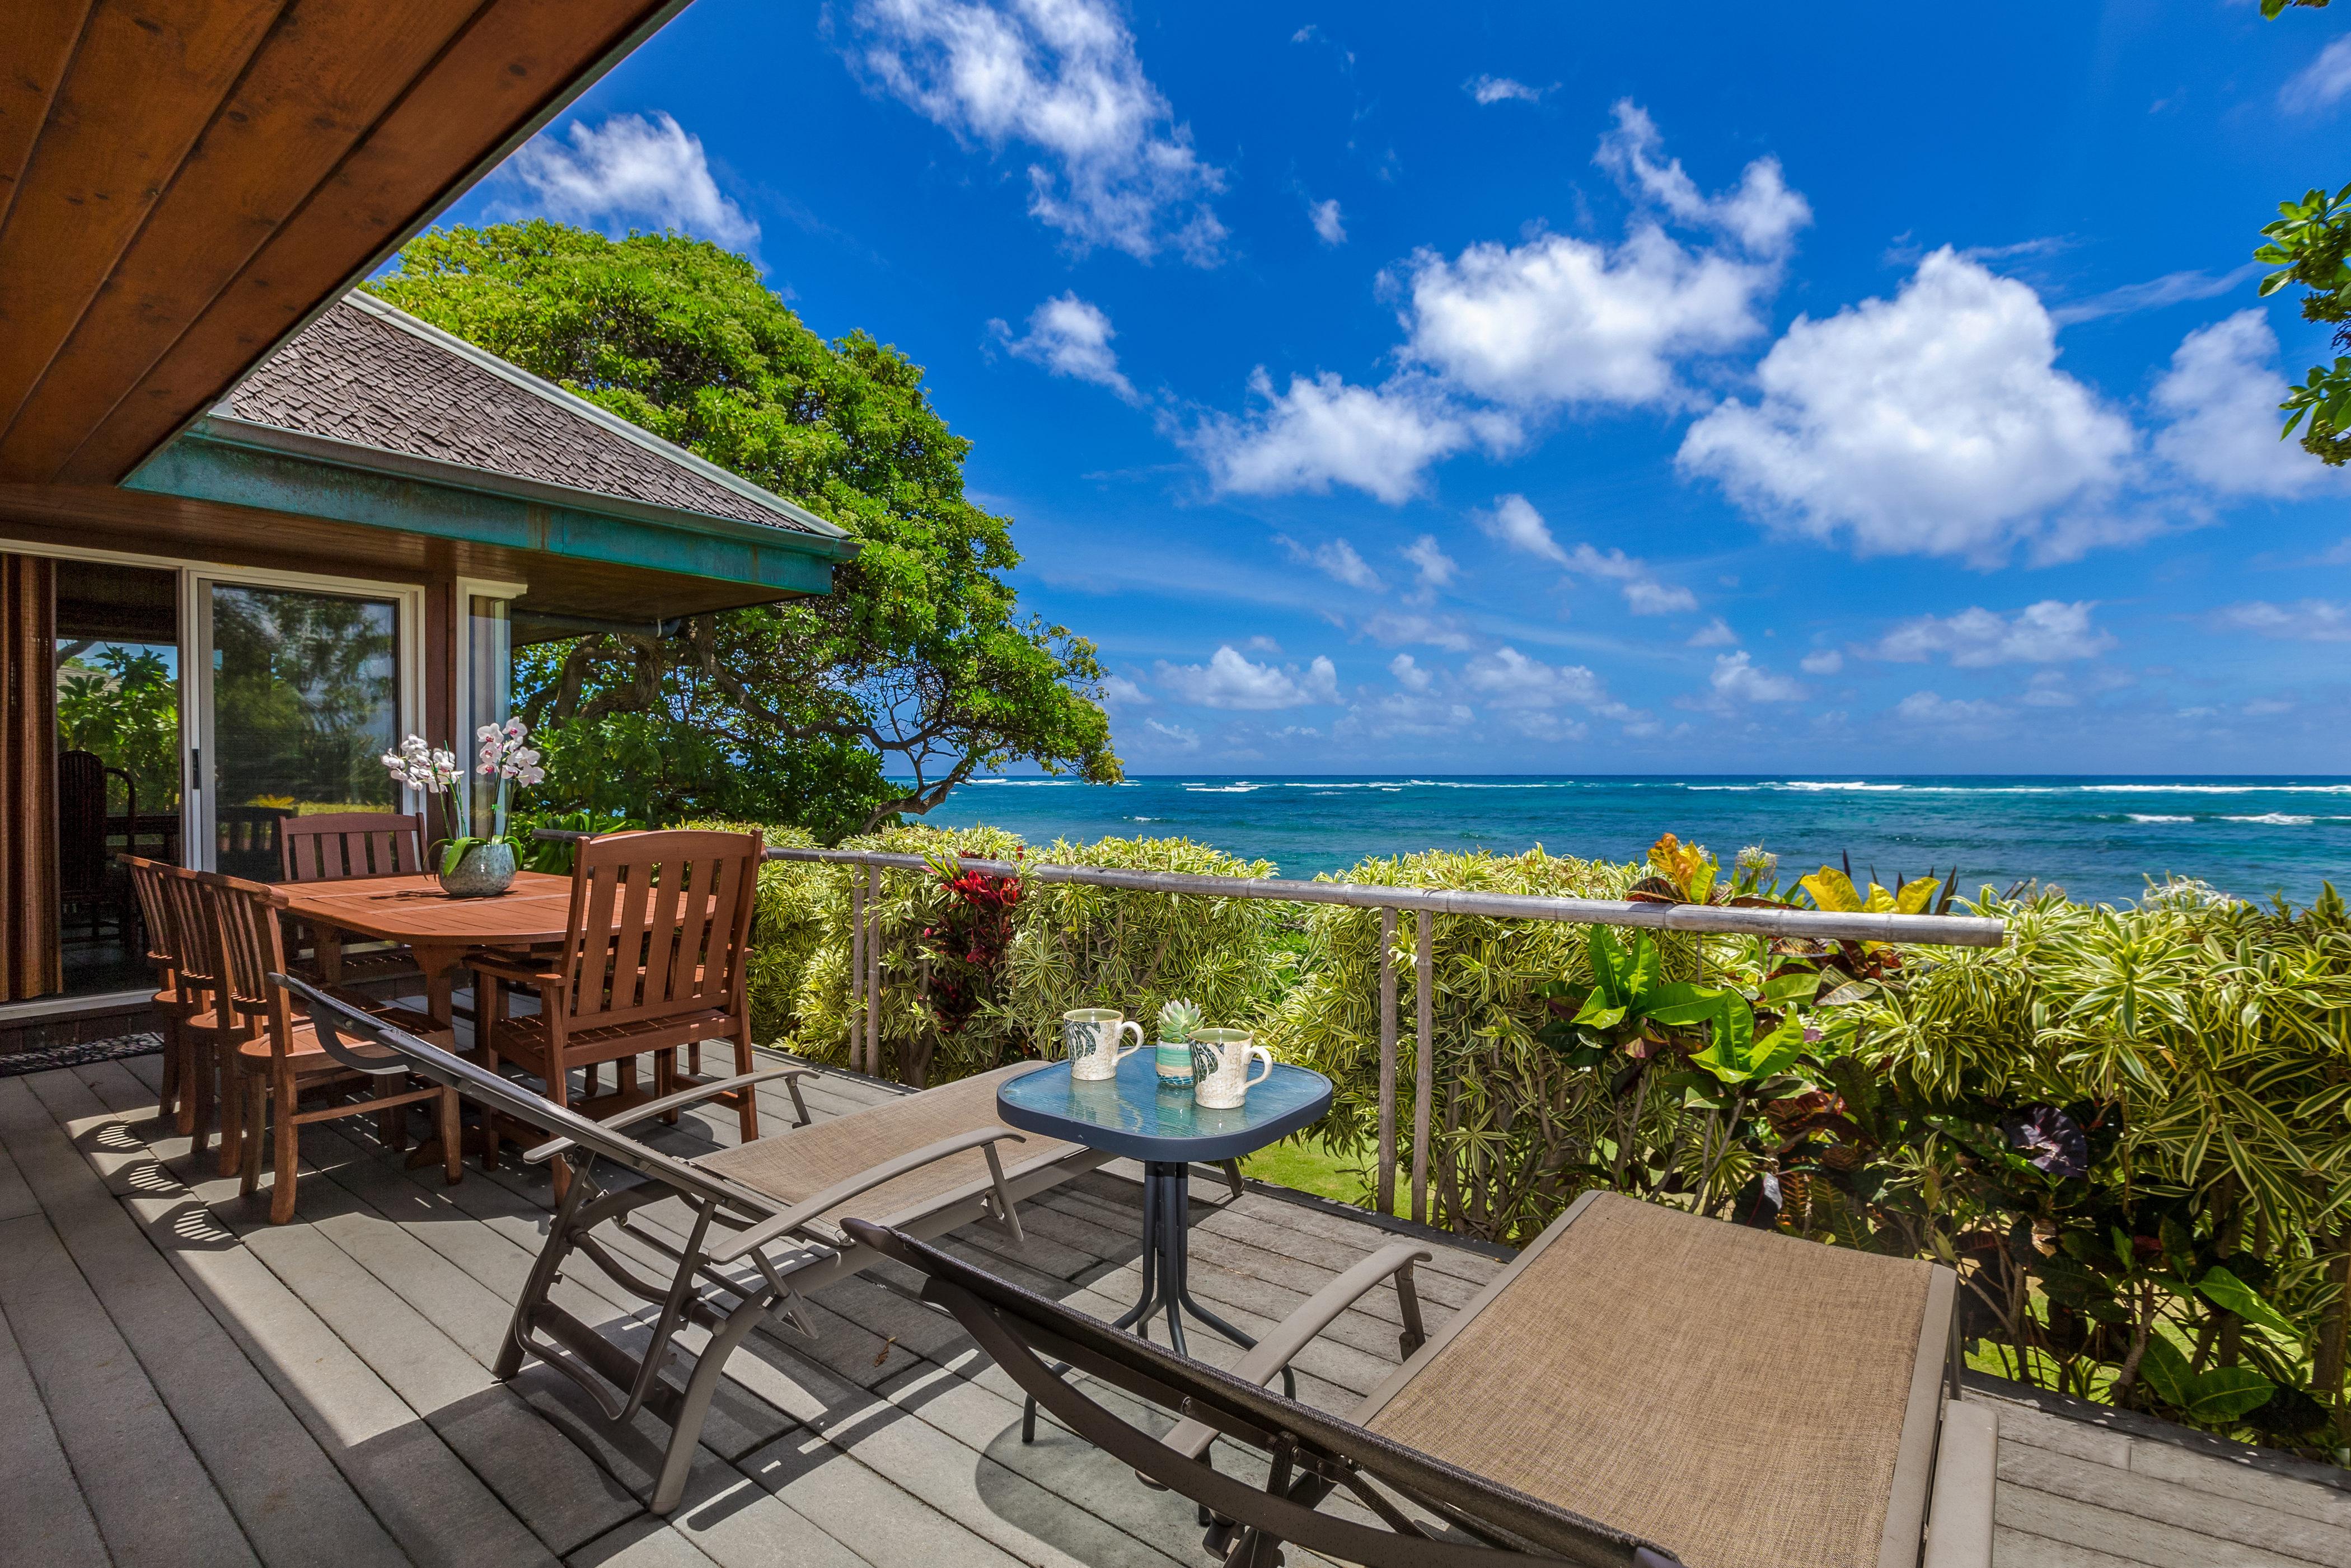 Hawaii Life Vacations